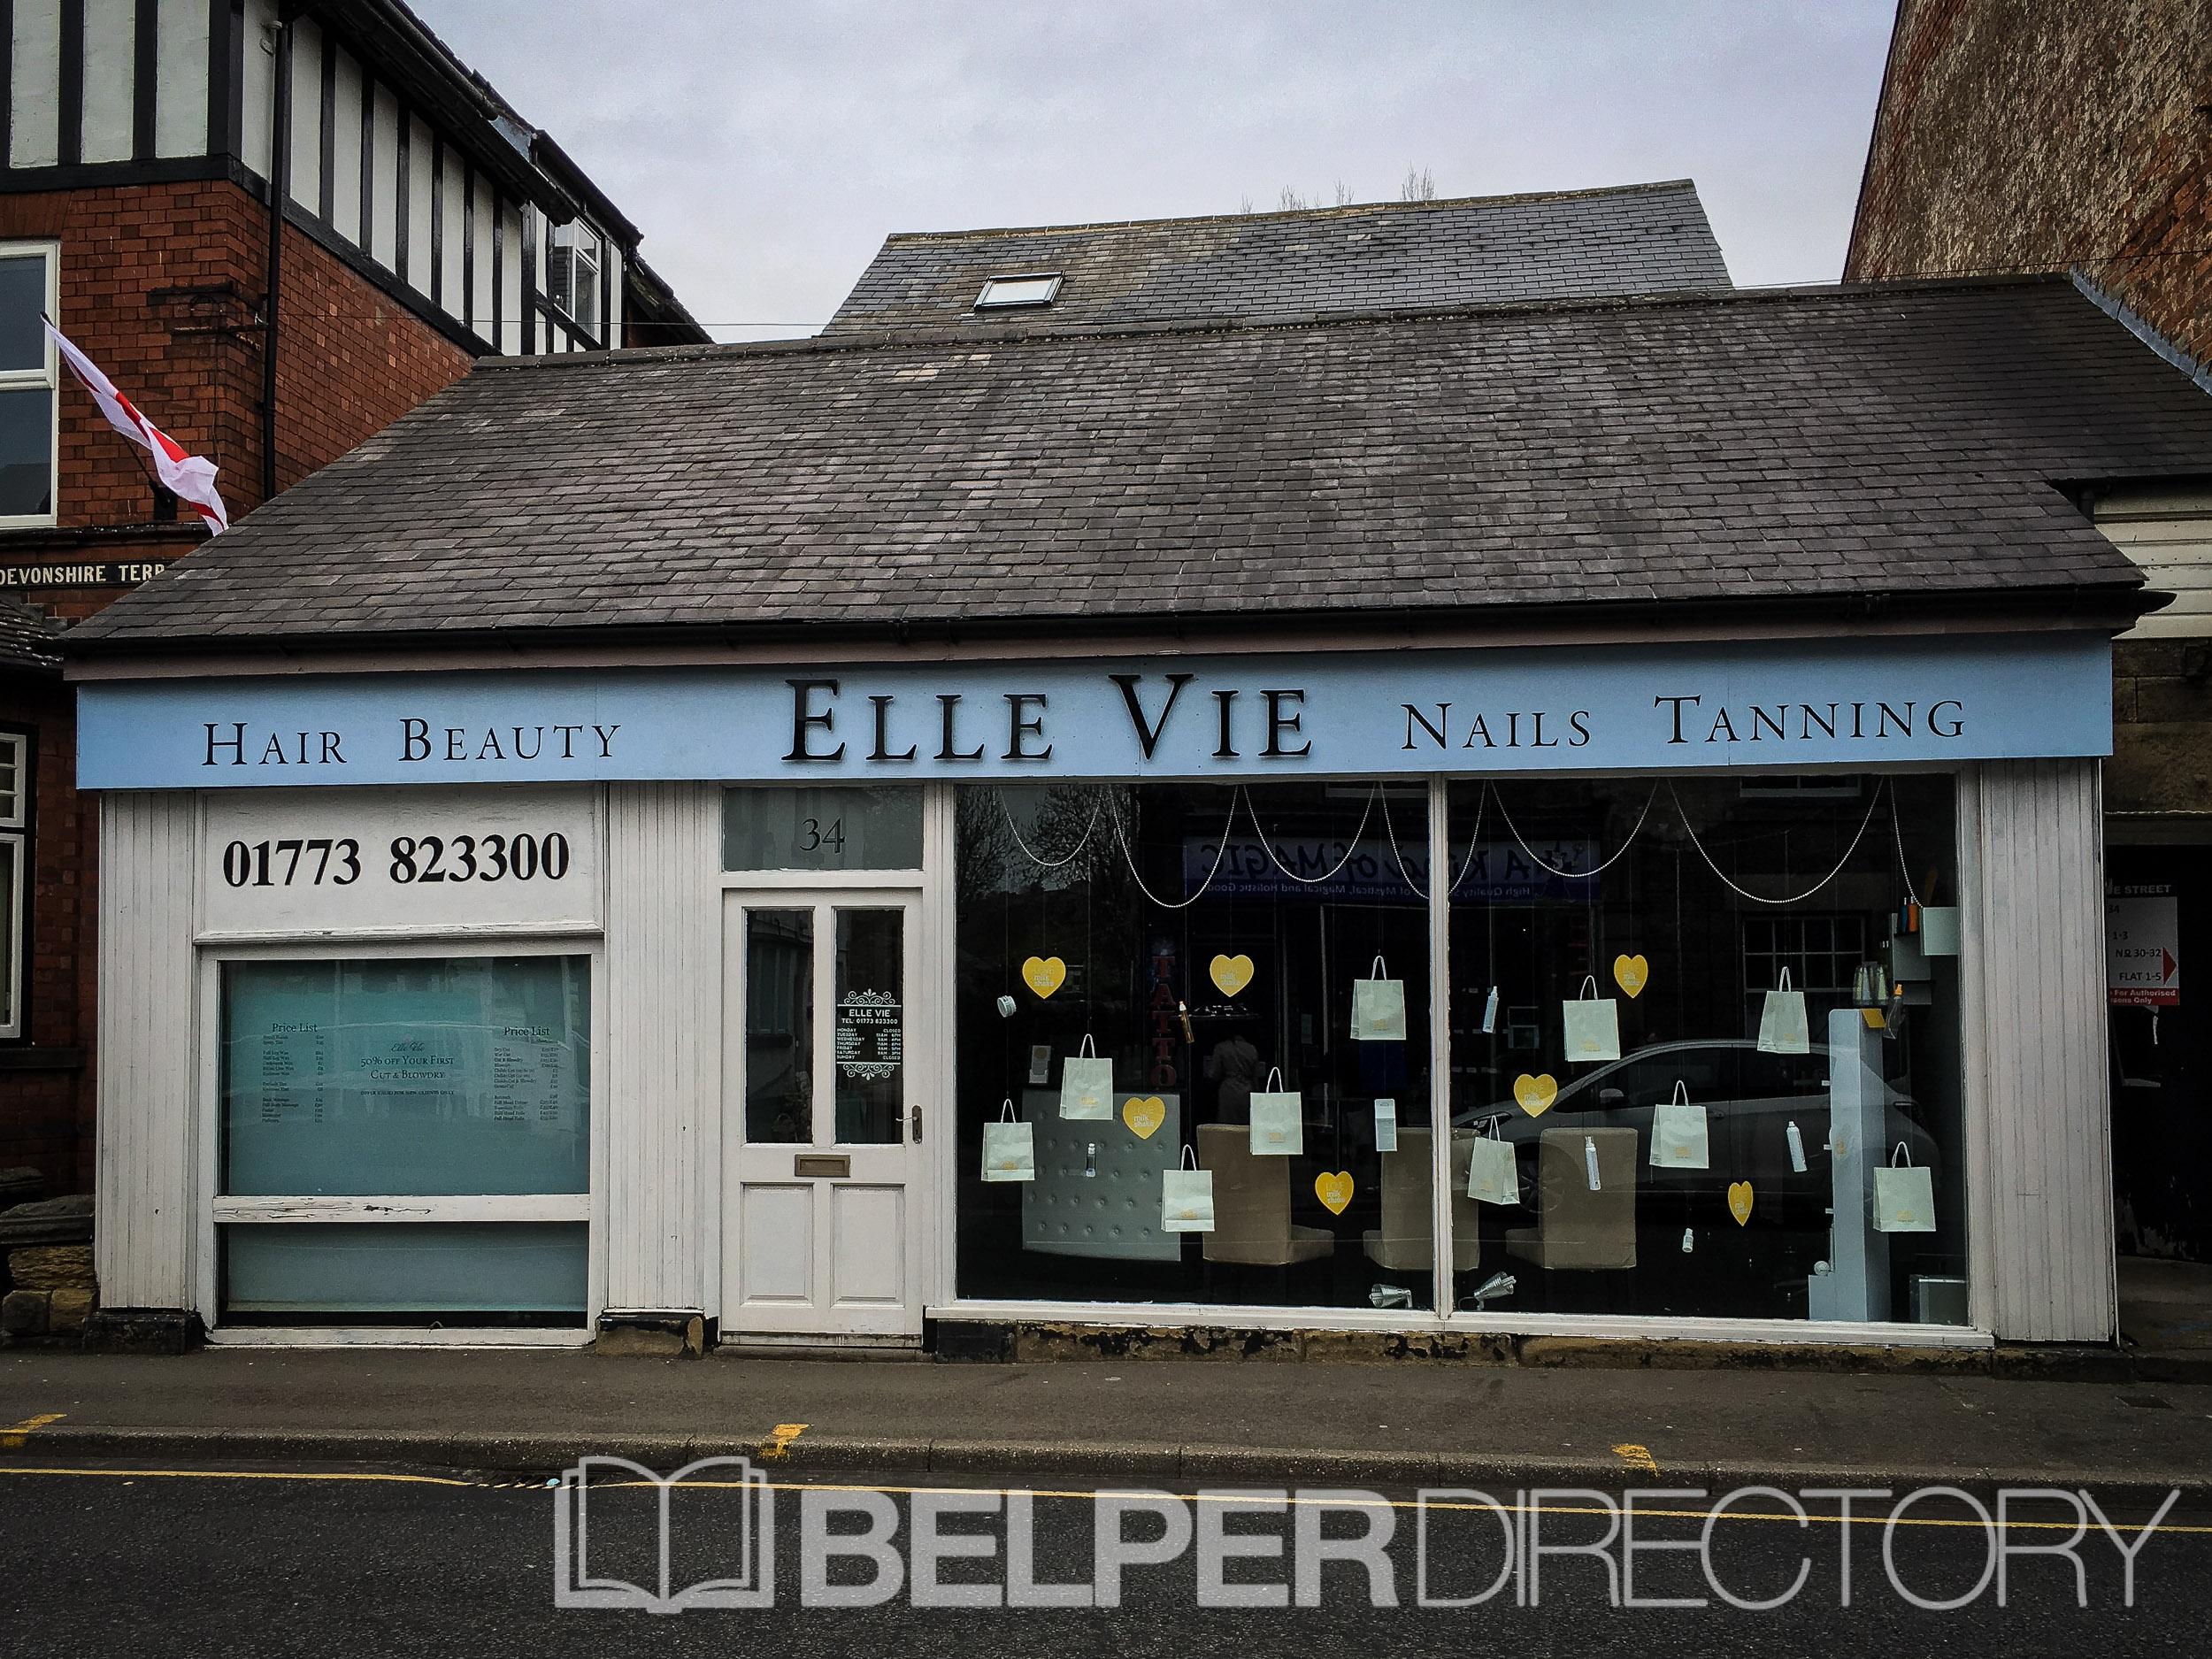 Elle Vie Hair & Beauty on Inter Search